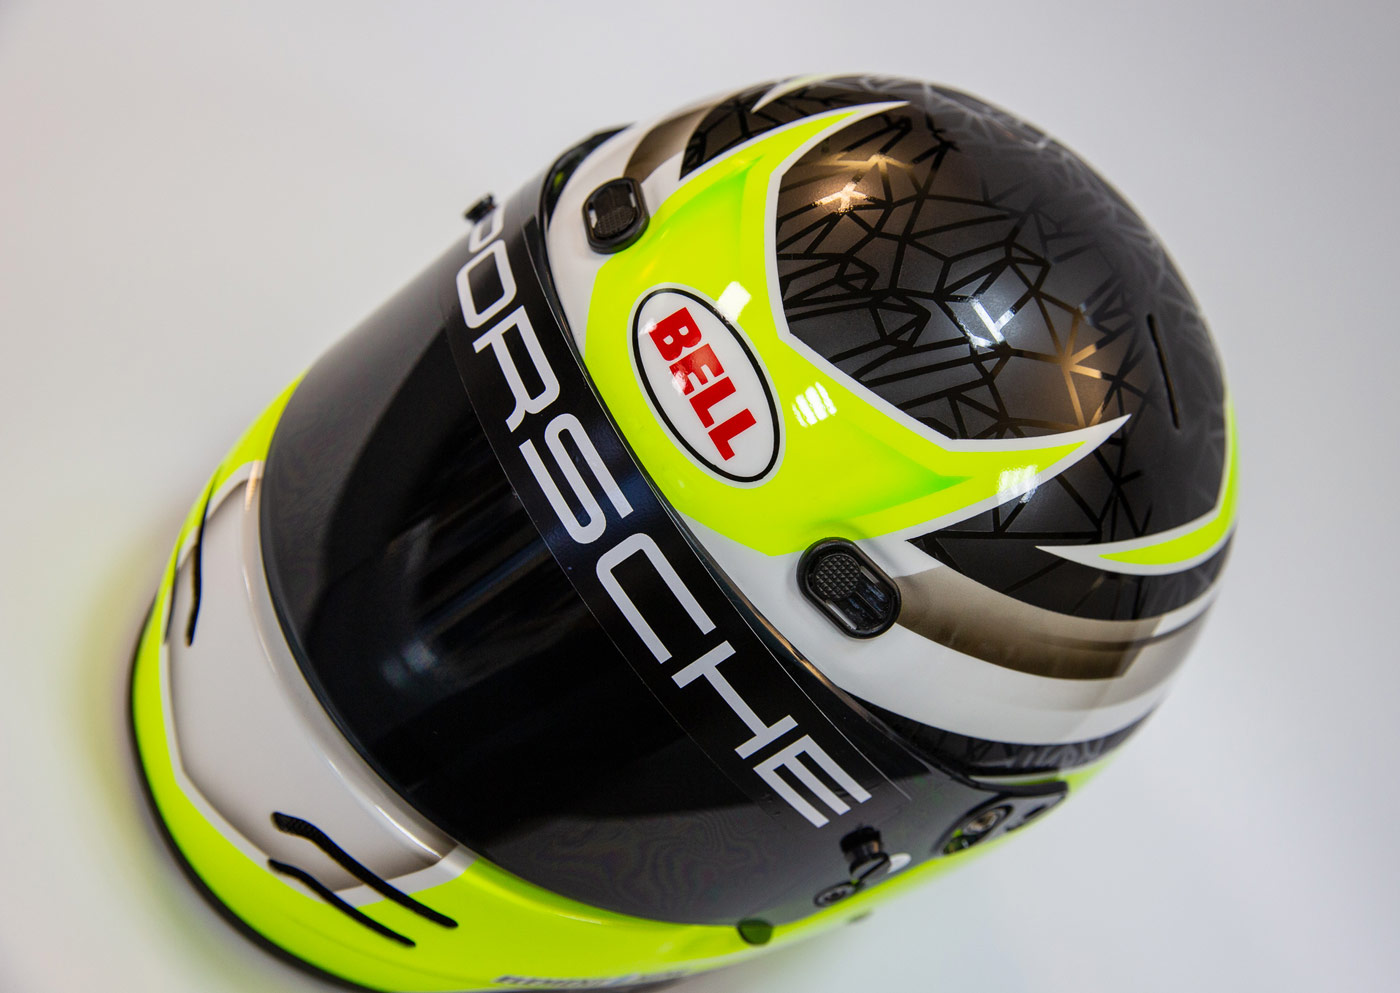 Sam-Beckett-Custom-painted-helmet-uk